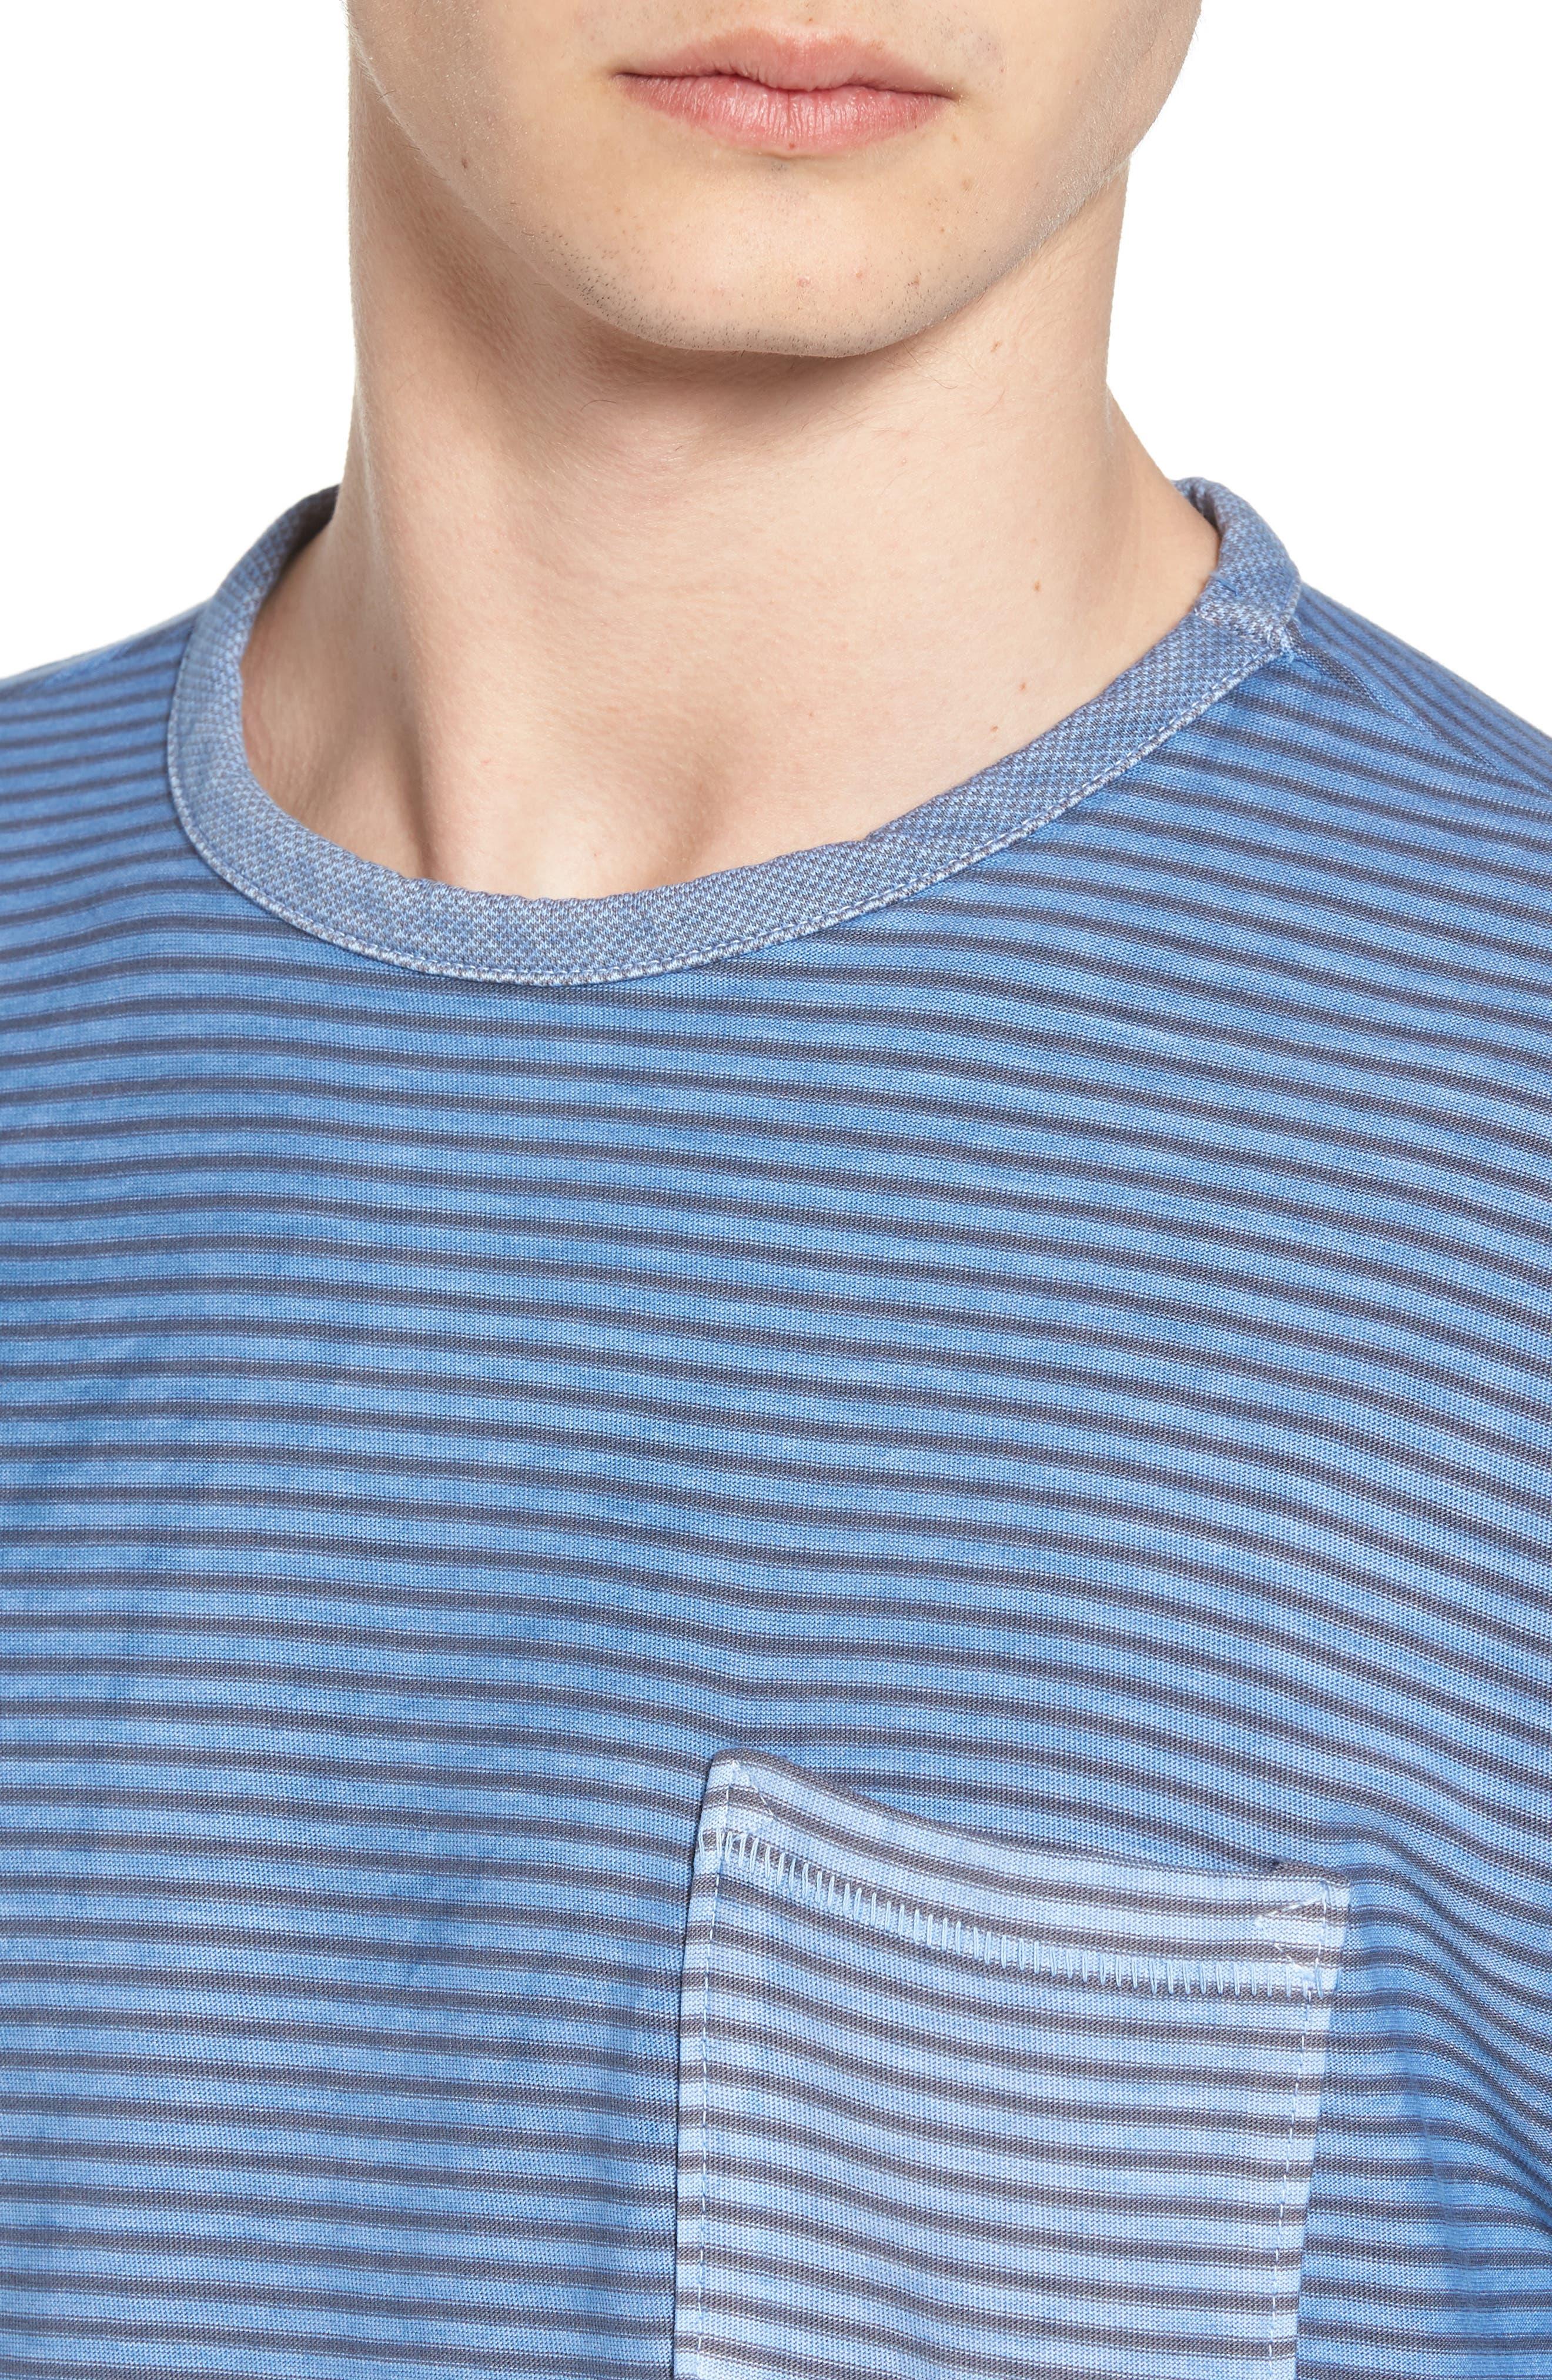 Stringer T-Shirt,                             Alternate thumbnail 4, color,                             Powder Blue